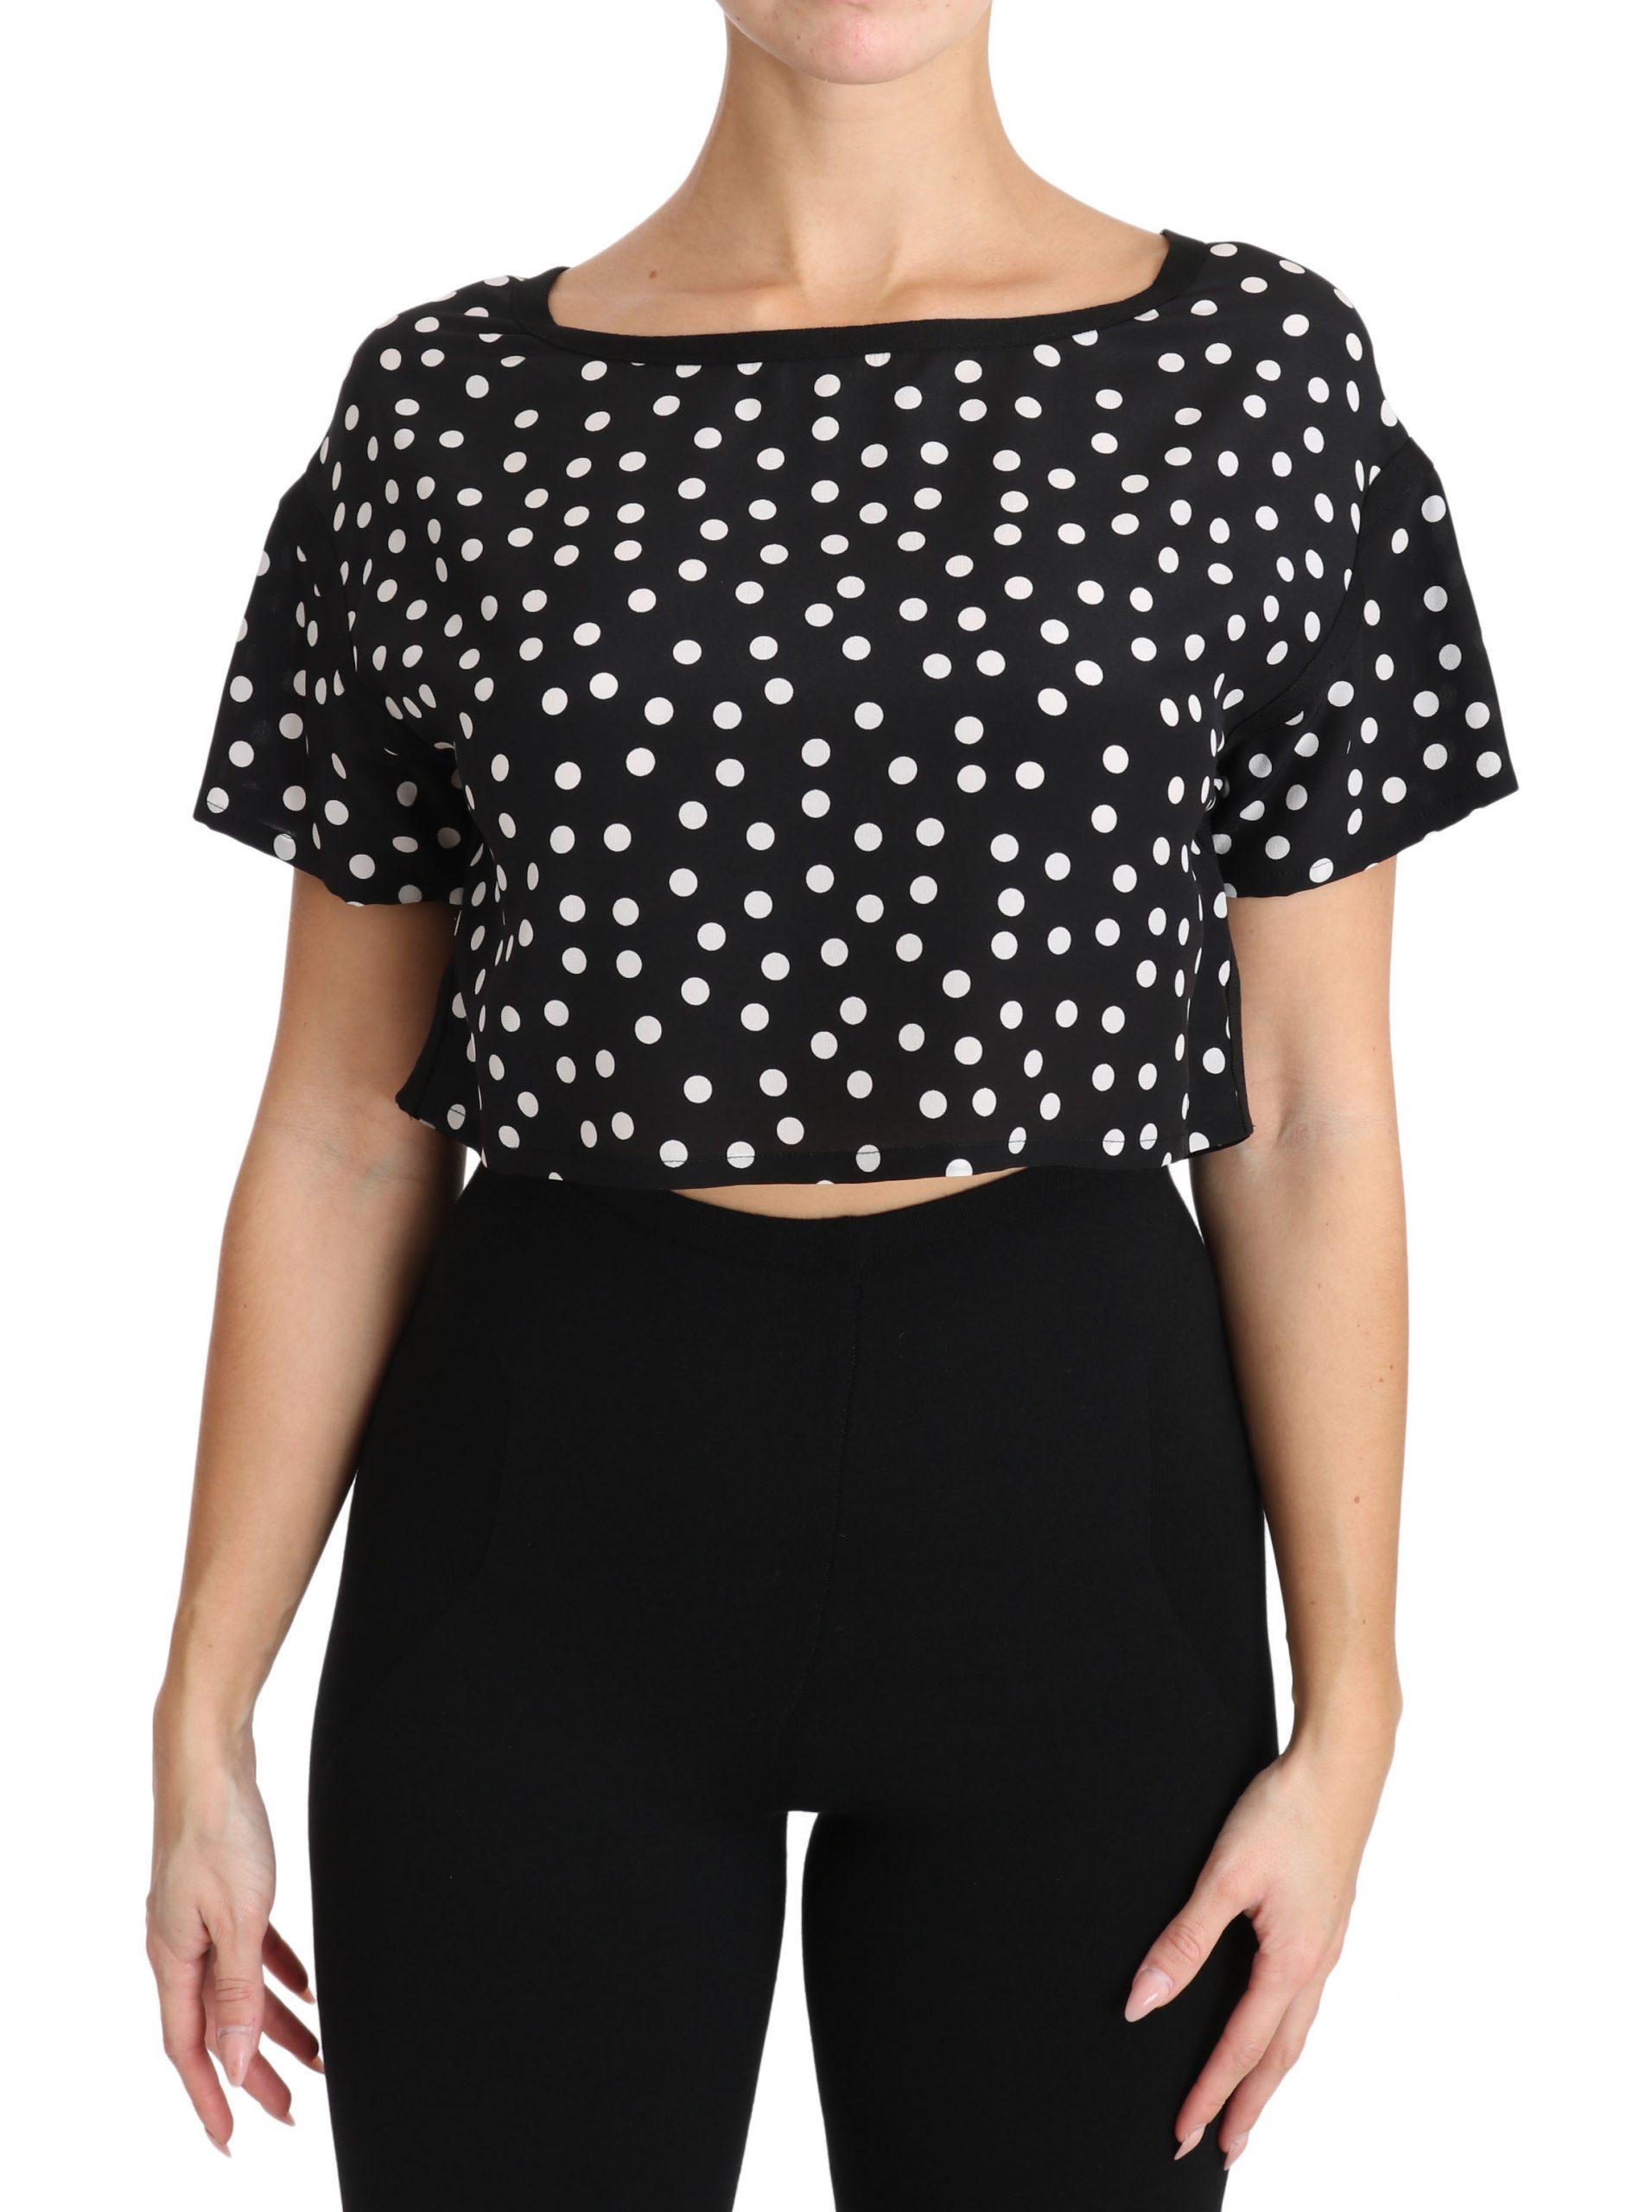 Dolce & Gabbana Women's Polka Dotted Cropped Top Black TSH3139 - IT38|XS